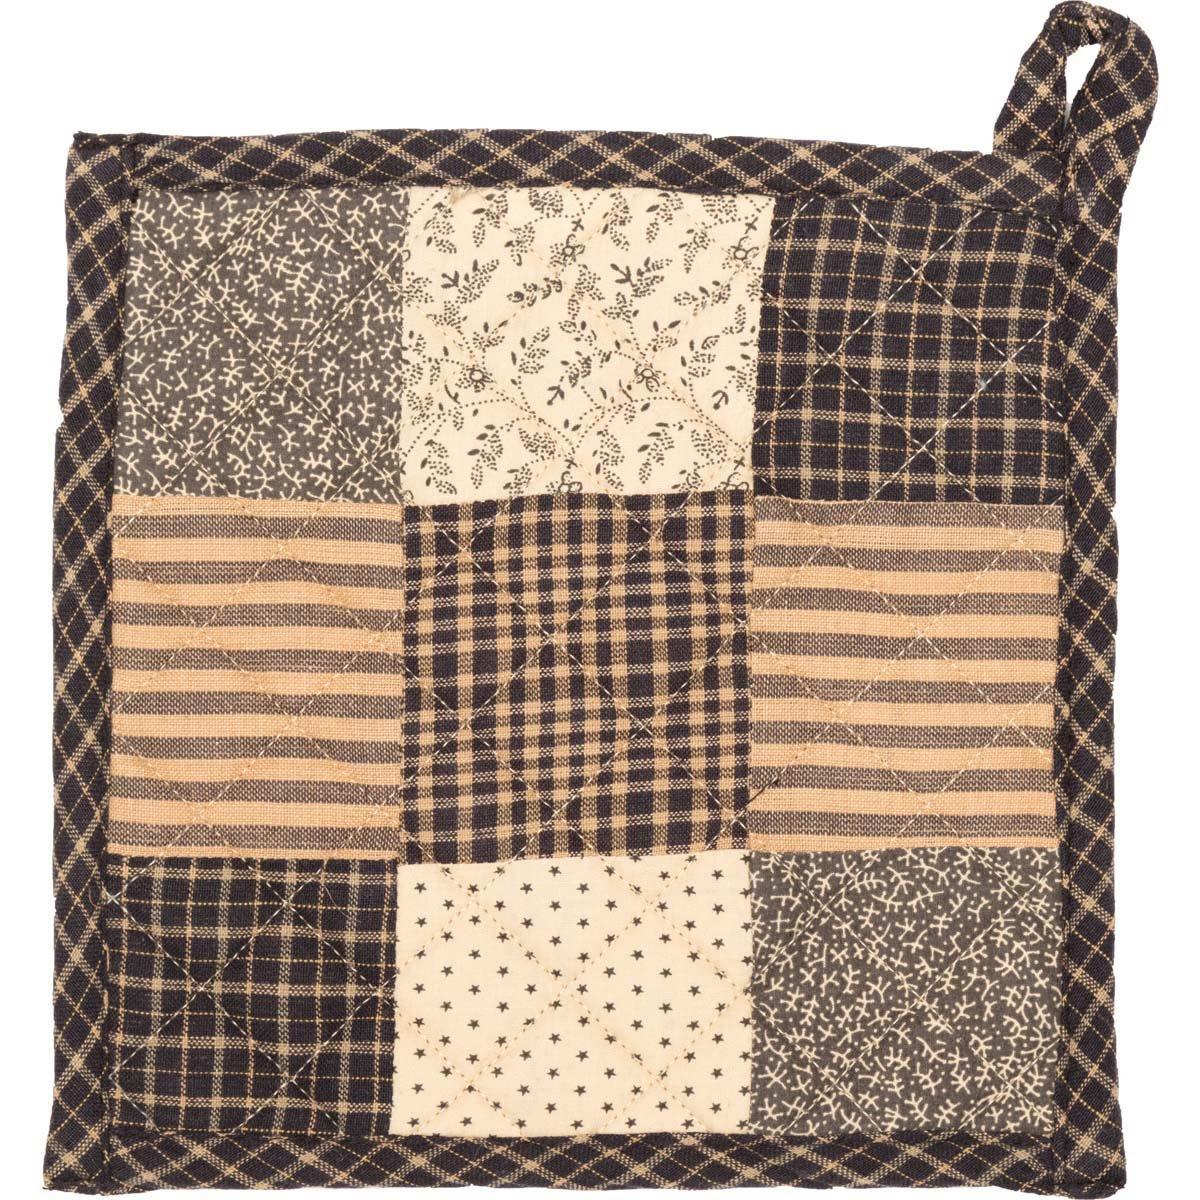 VHC Brands Primitive Tabletop Kitchen Prim Grove Fabric Loop Cotton Patchwork Pot Holder One Size 7186